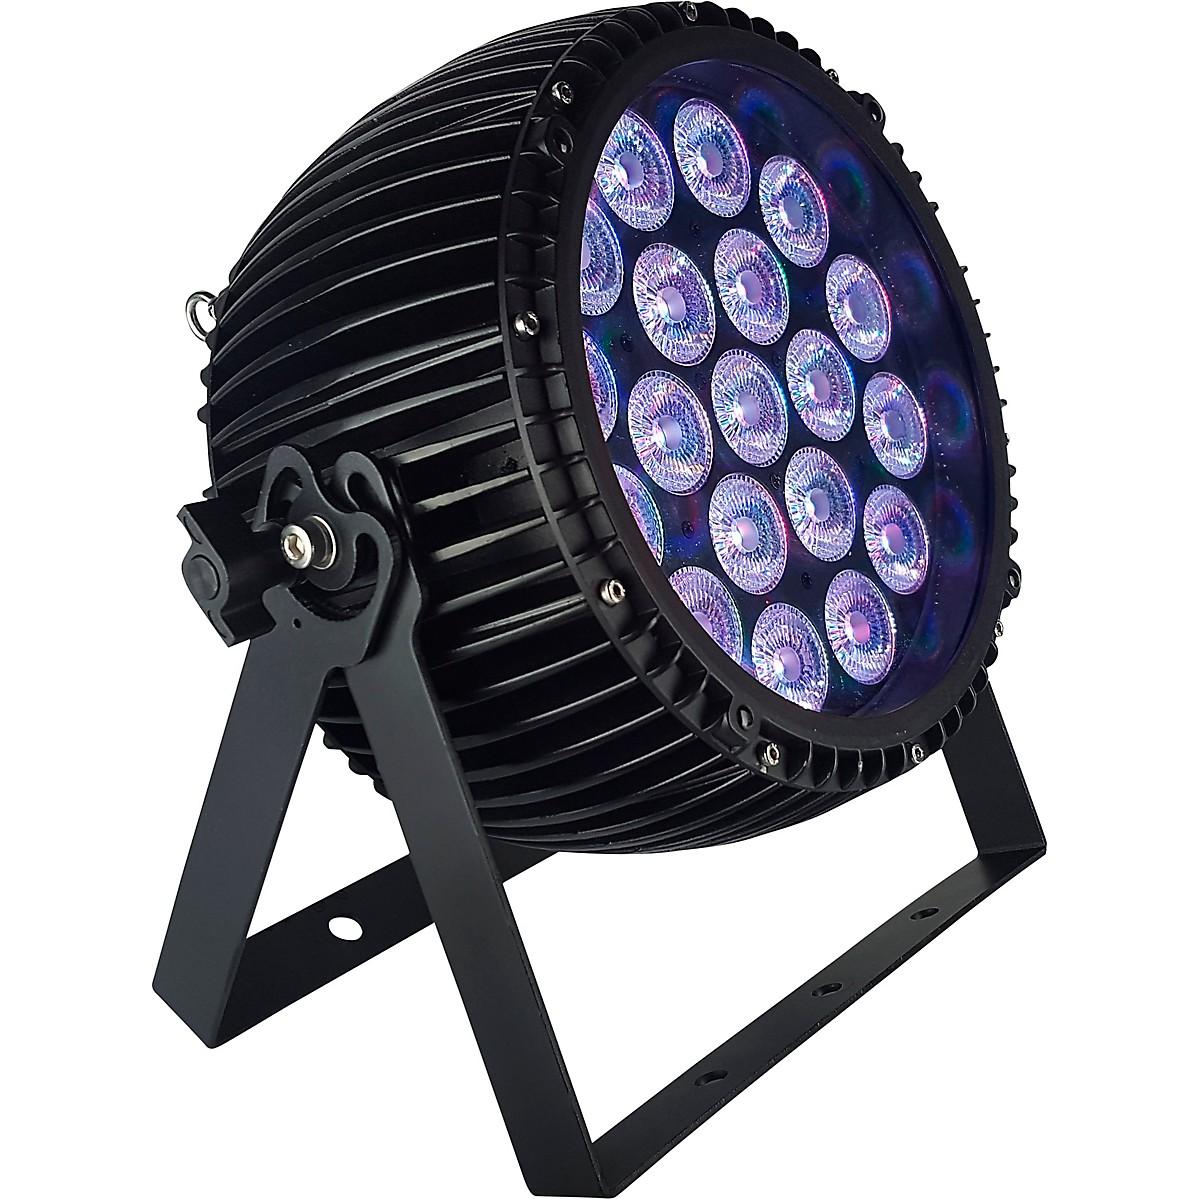 Blizzard TOURnado WiMAX Quadra Outdoor-Rated RGBW LED PAR Wash Light